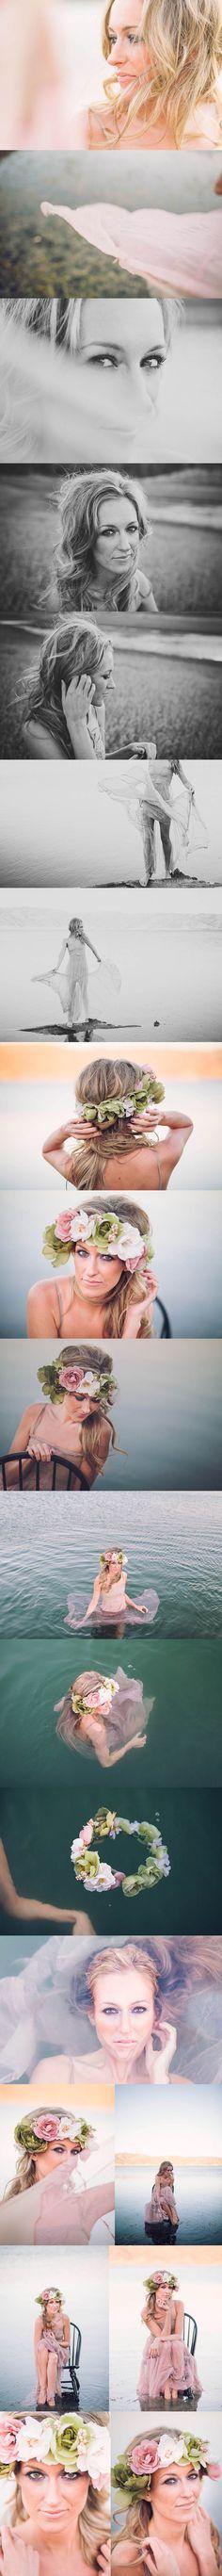 Courtney Stockton | Fashion Photography Inspiration